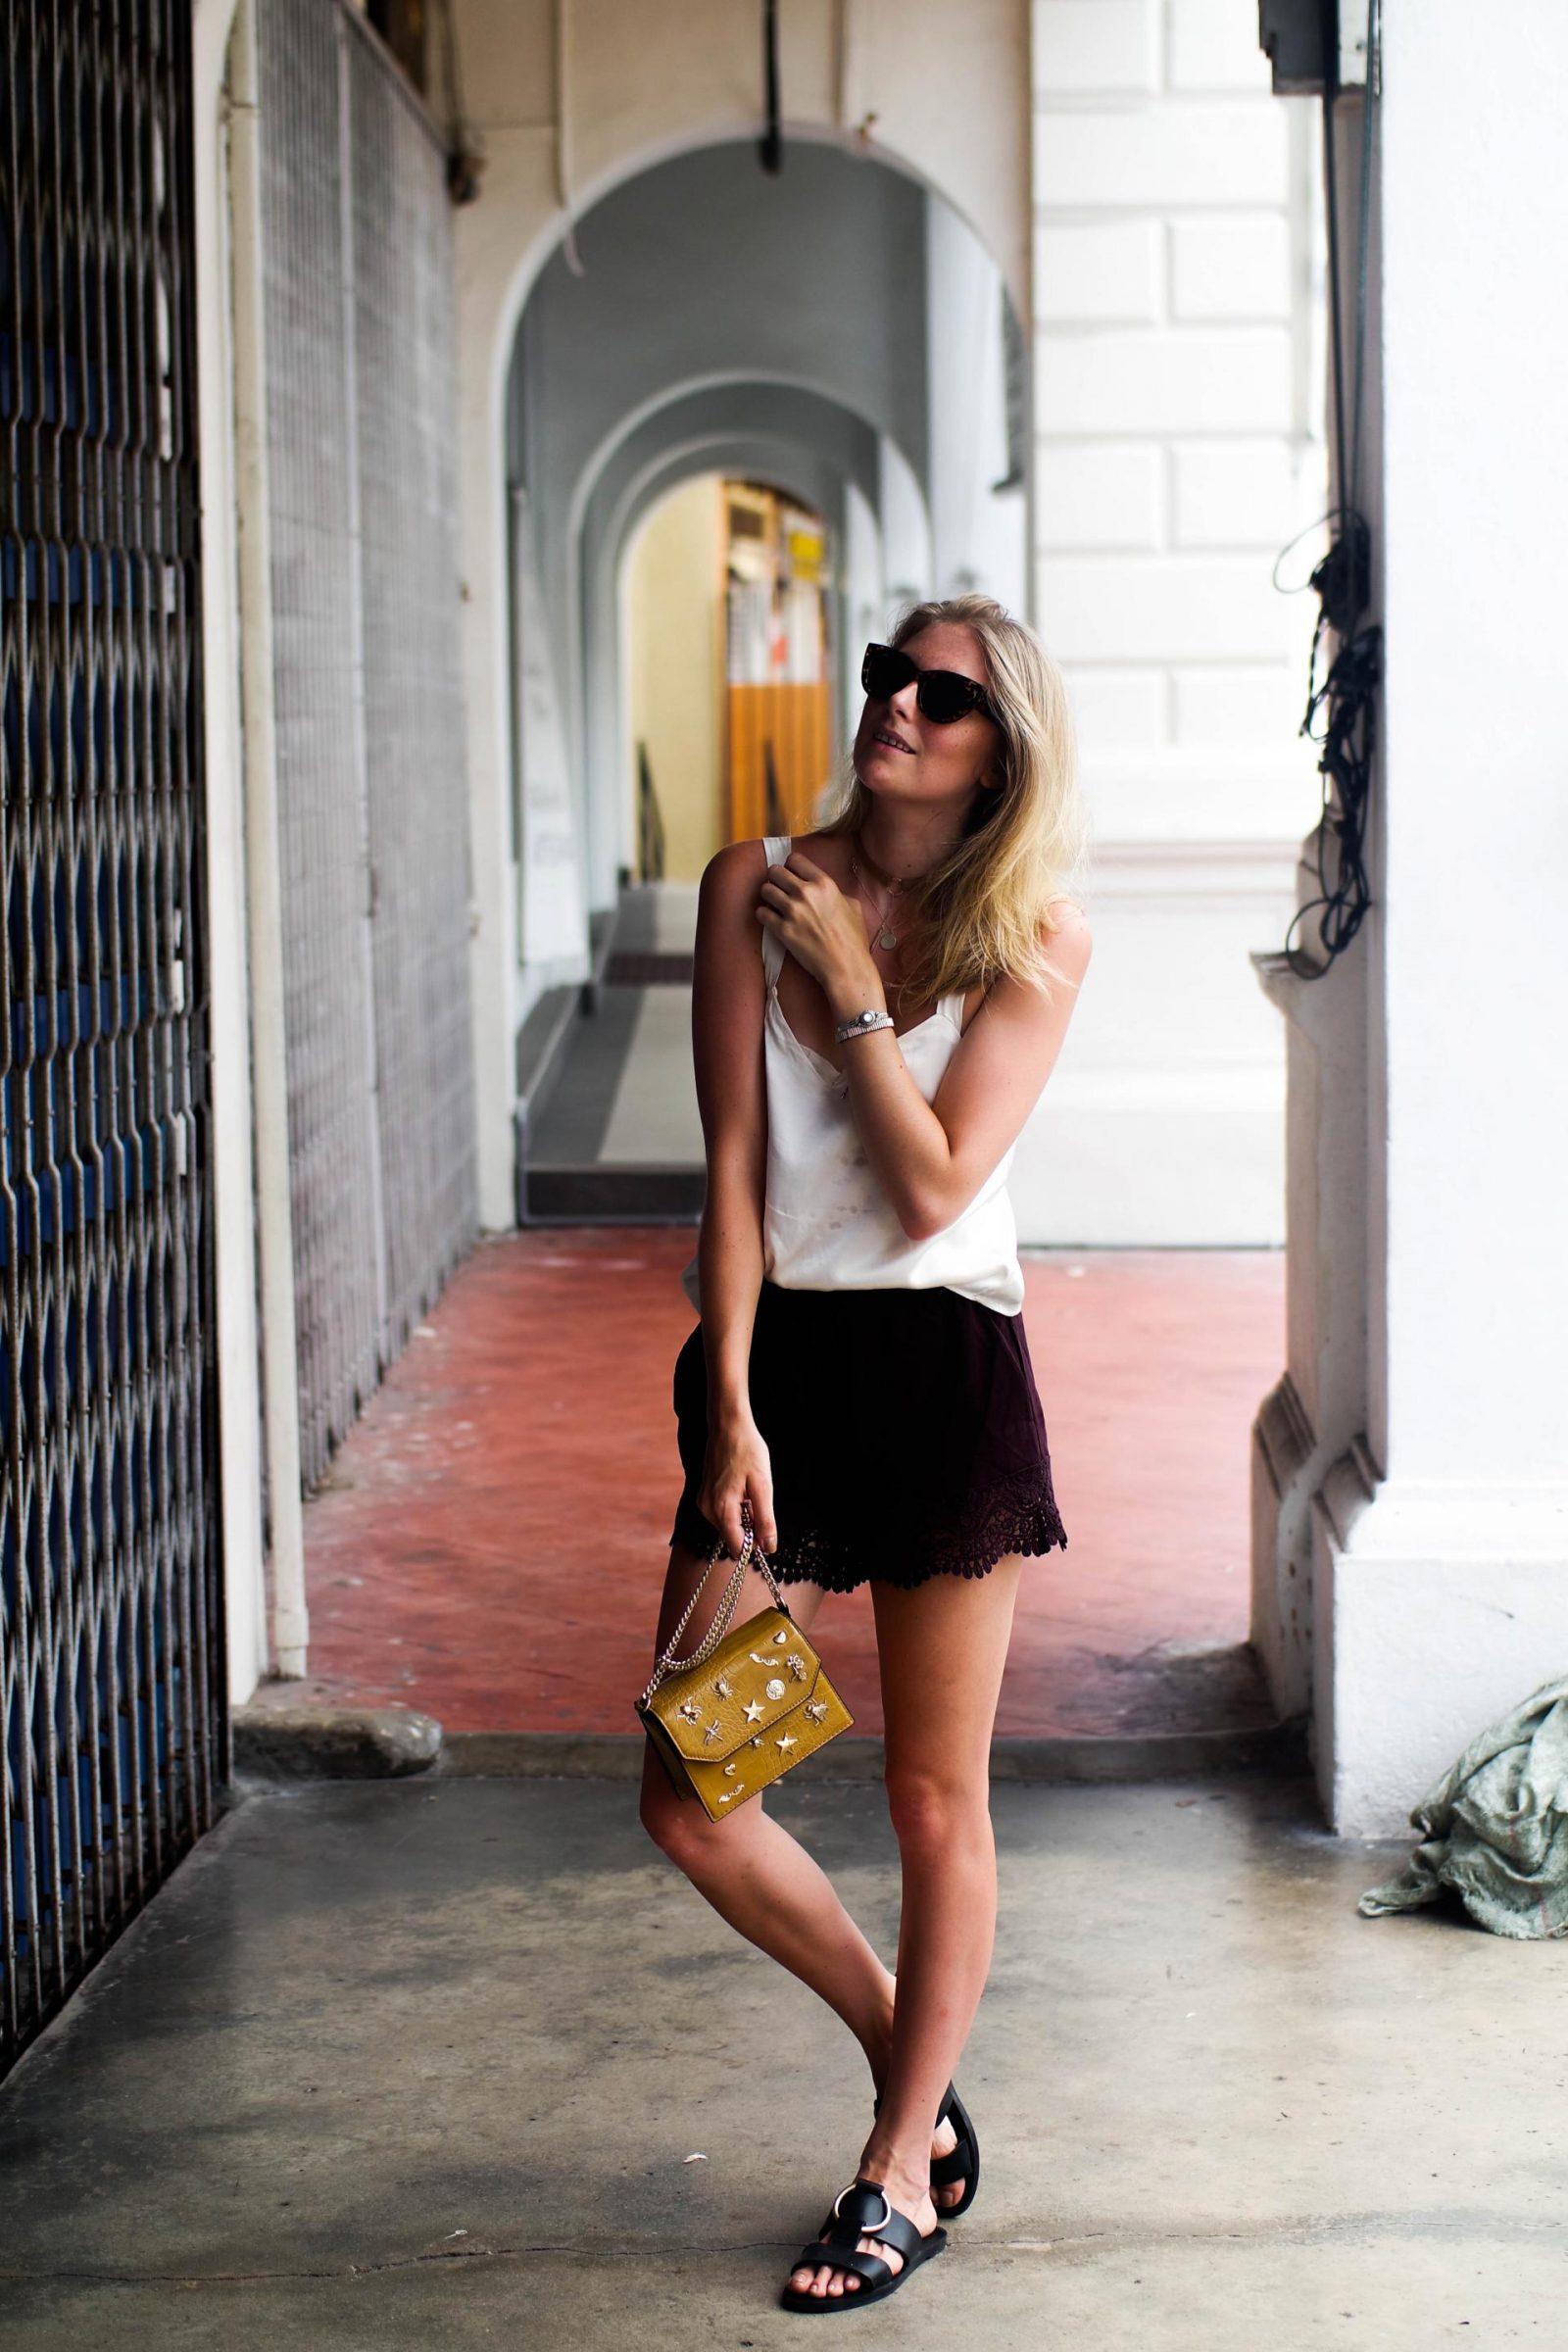 Silky Tops Scallop Shorts Melaka